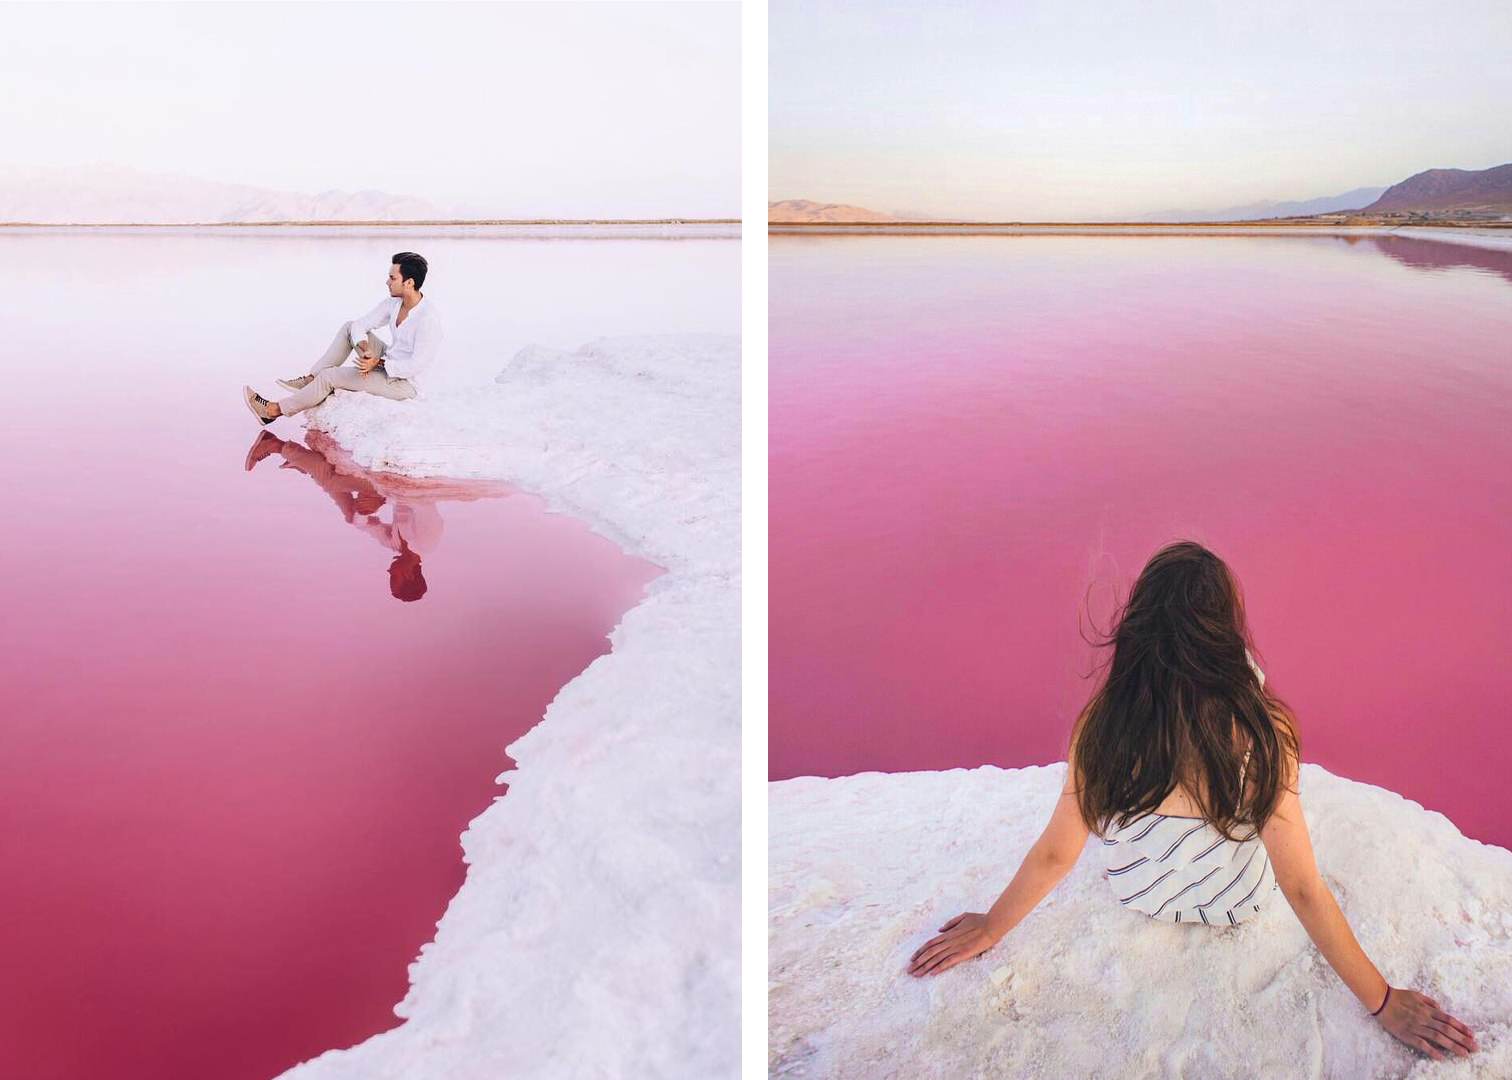 Розовое озеро Махарлу Иран 3